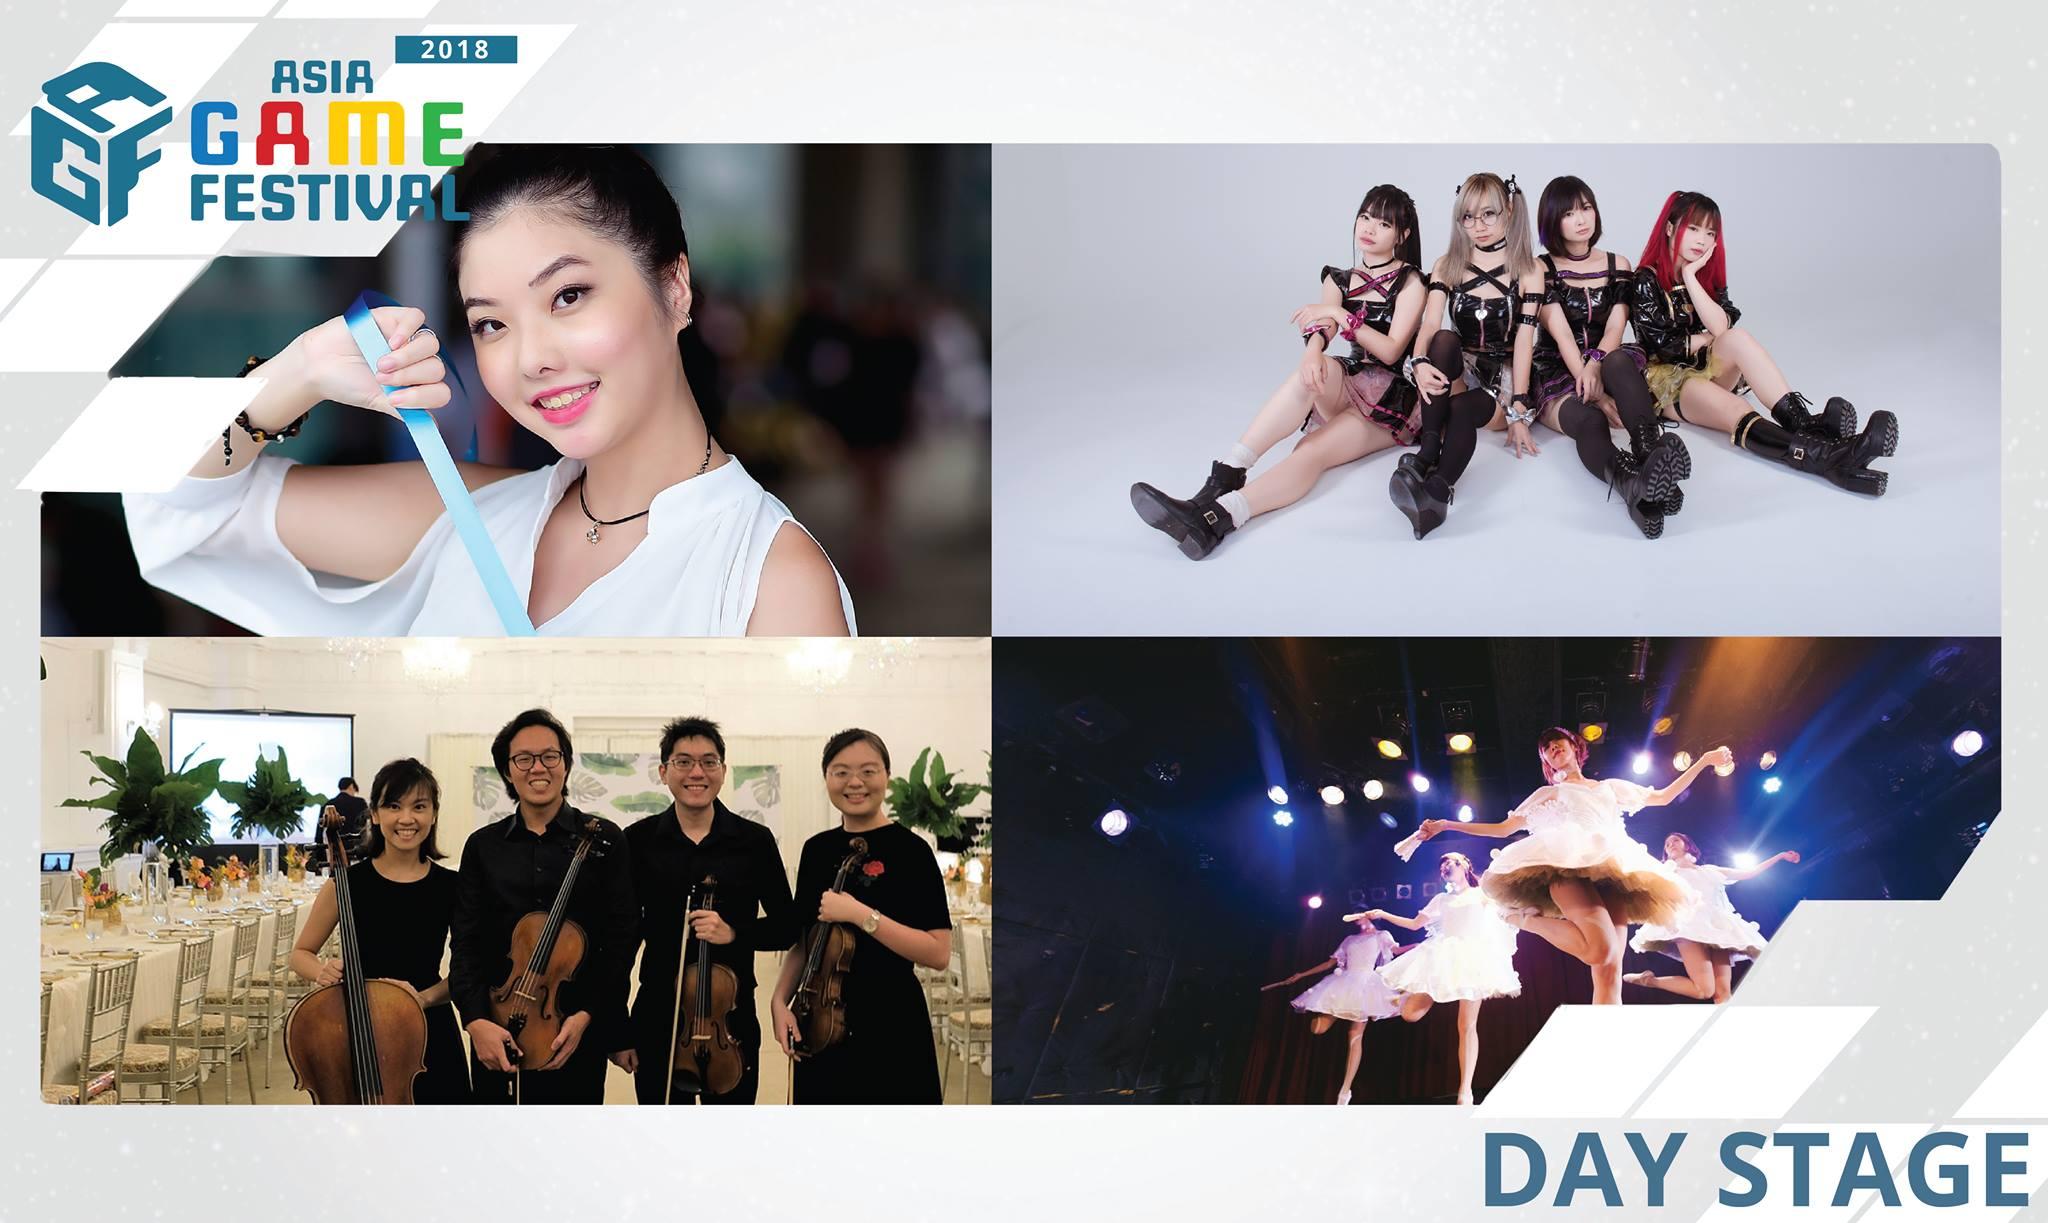 Asia GAME Festival 2018